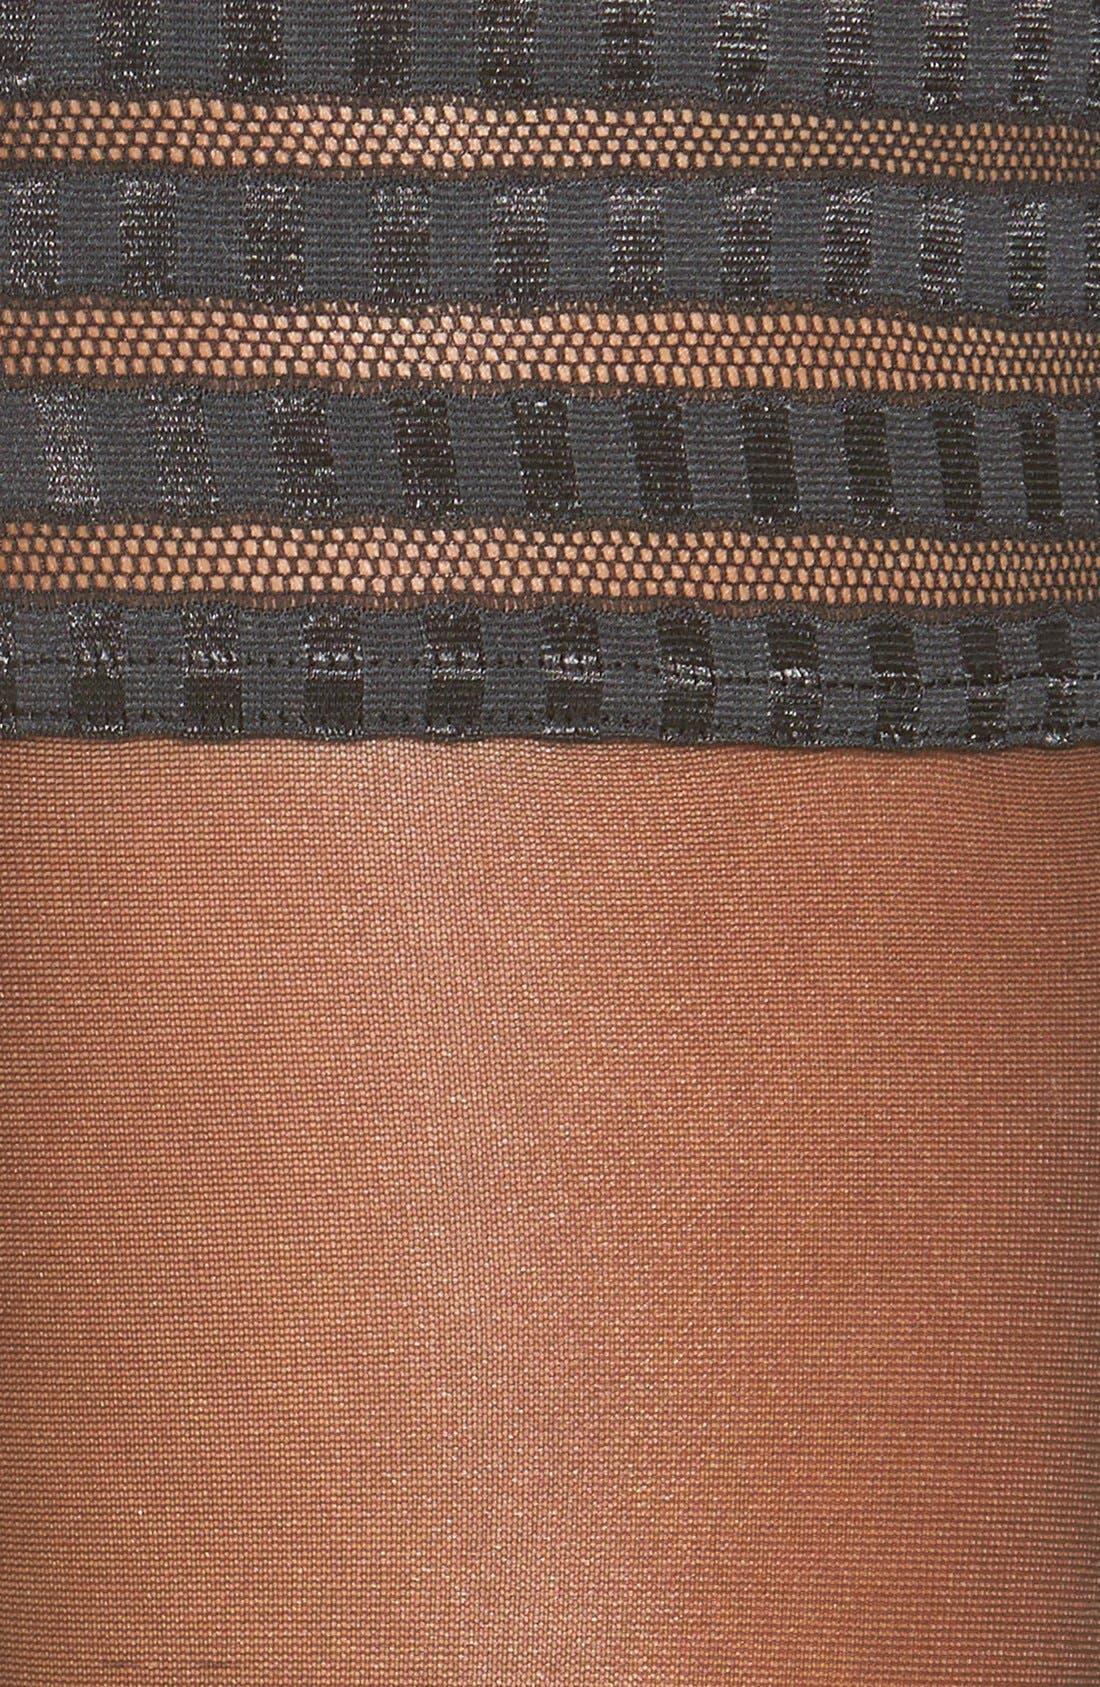 'Pure Matt 20' Stay-Up Stockings,                             Alternate thumbnail 15, color,